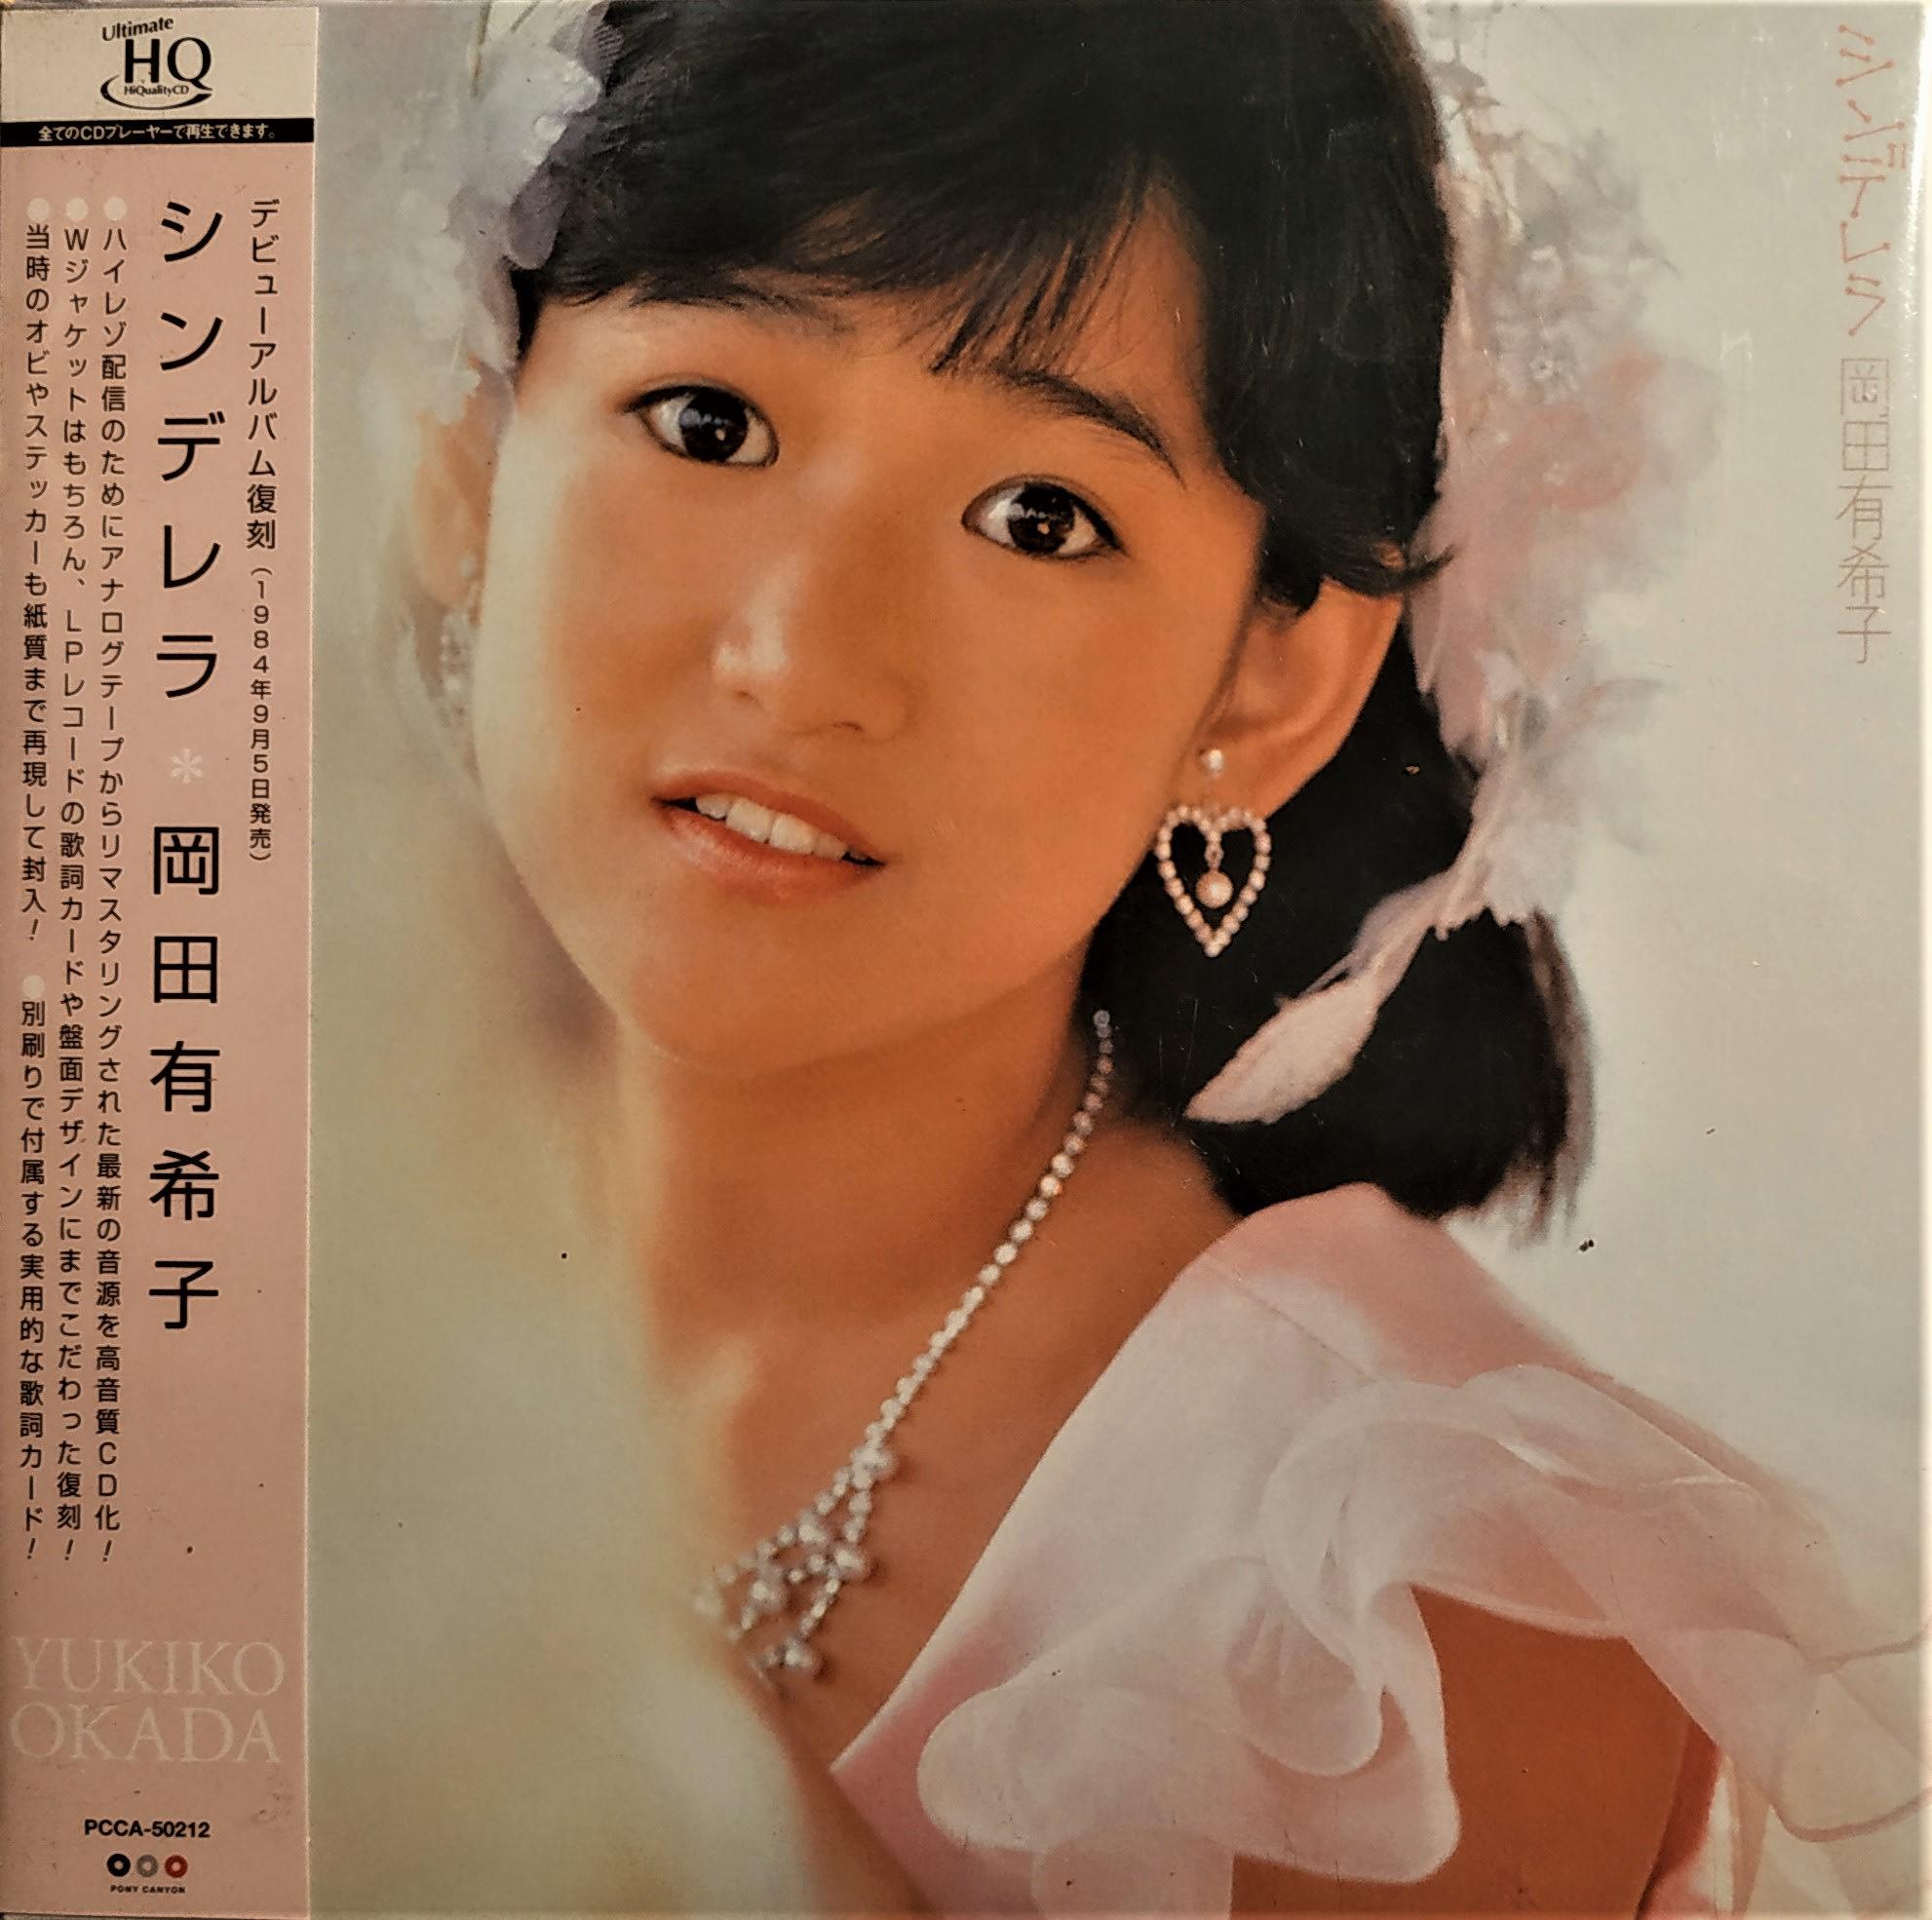 【限定盤/UHQCD】 岡田有希子 --- シンデレラ ~ 日版已拆近全新, 超高音質, 早已絕版